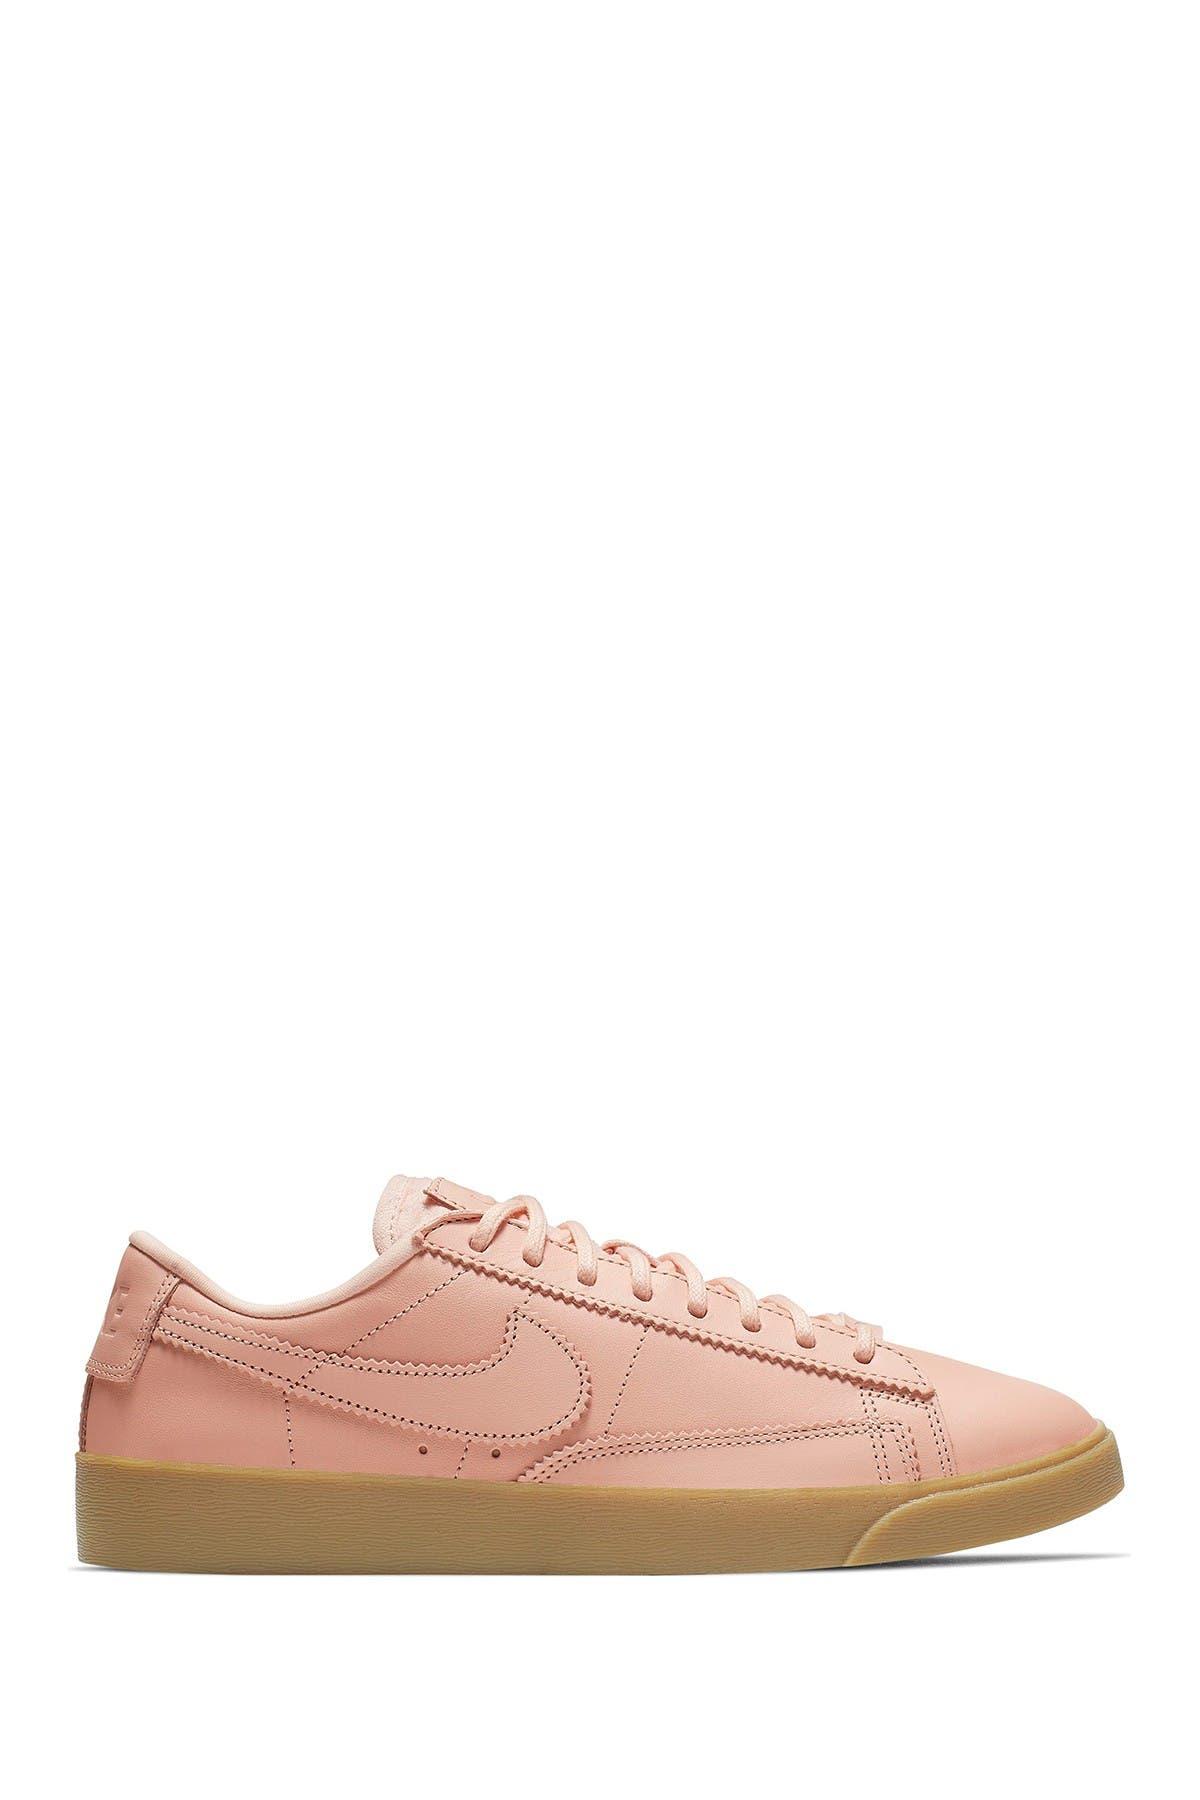 Image of Nike Blazer Low LXX Sneaker